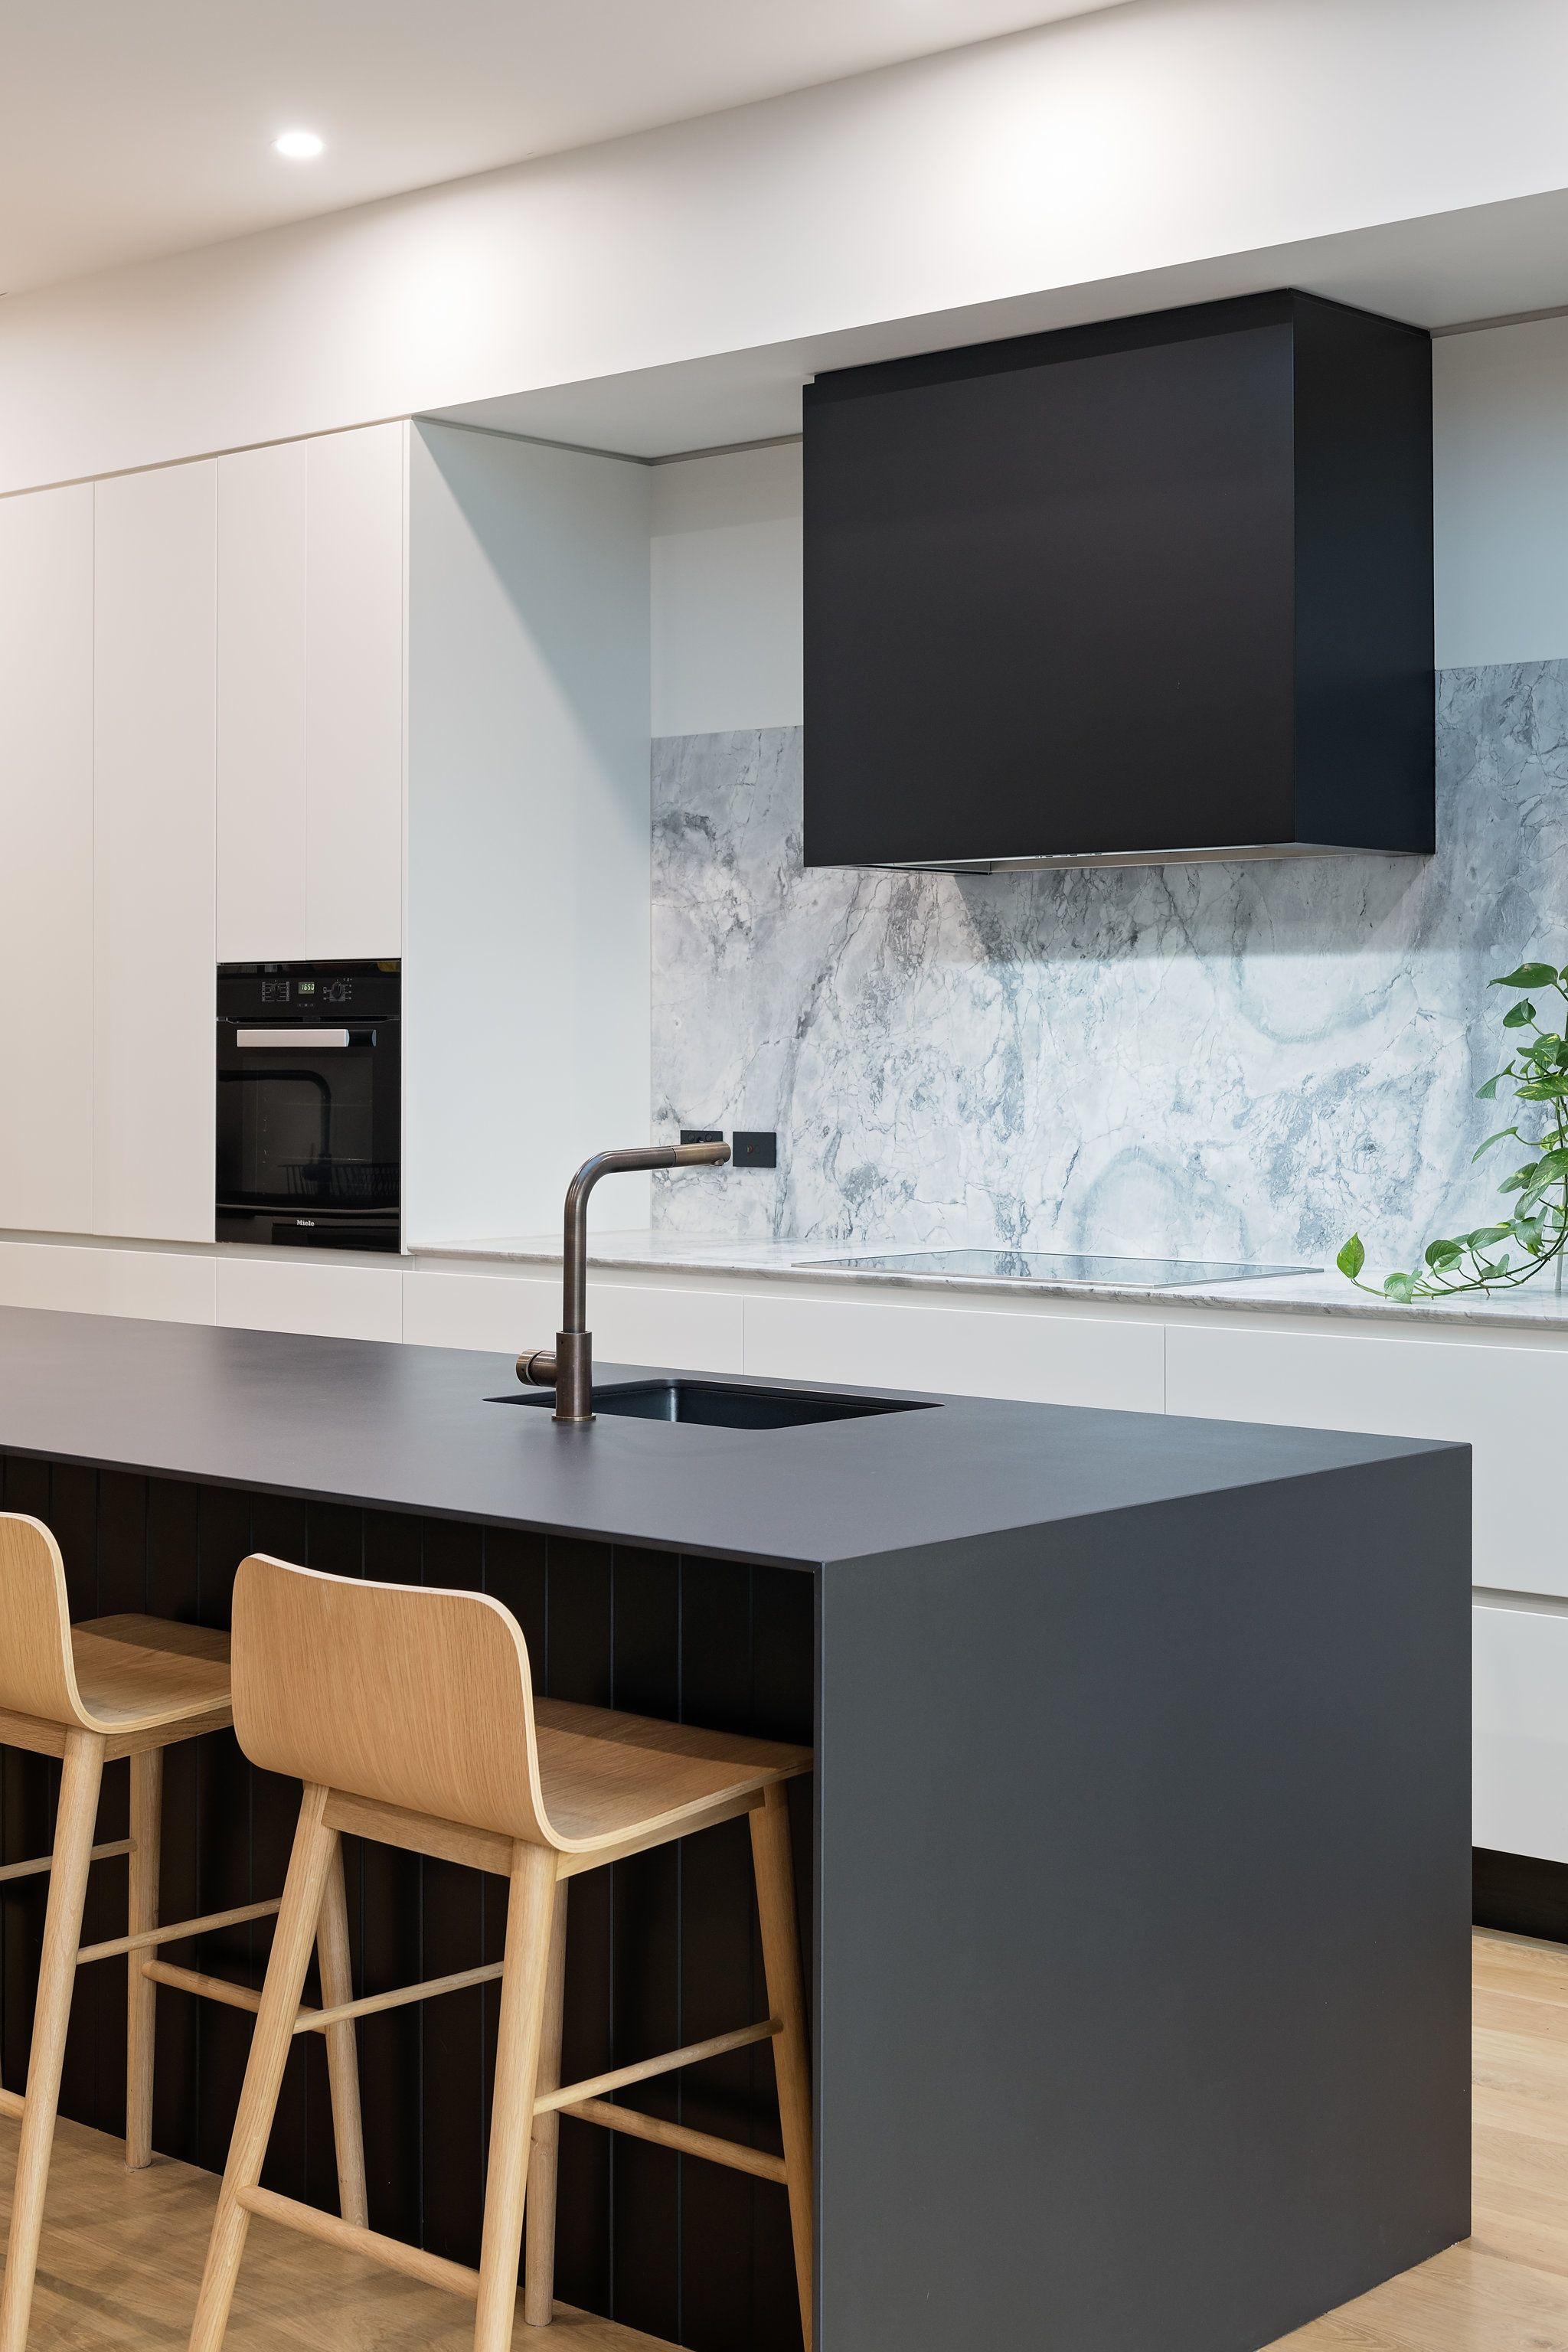 Dekton Island Bench With A Super White Marble Splashback Manufactured And Installed By Steedform Amazing S Interior Design Kitchen White Kitchen Tiles Dekton